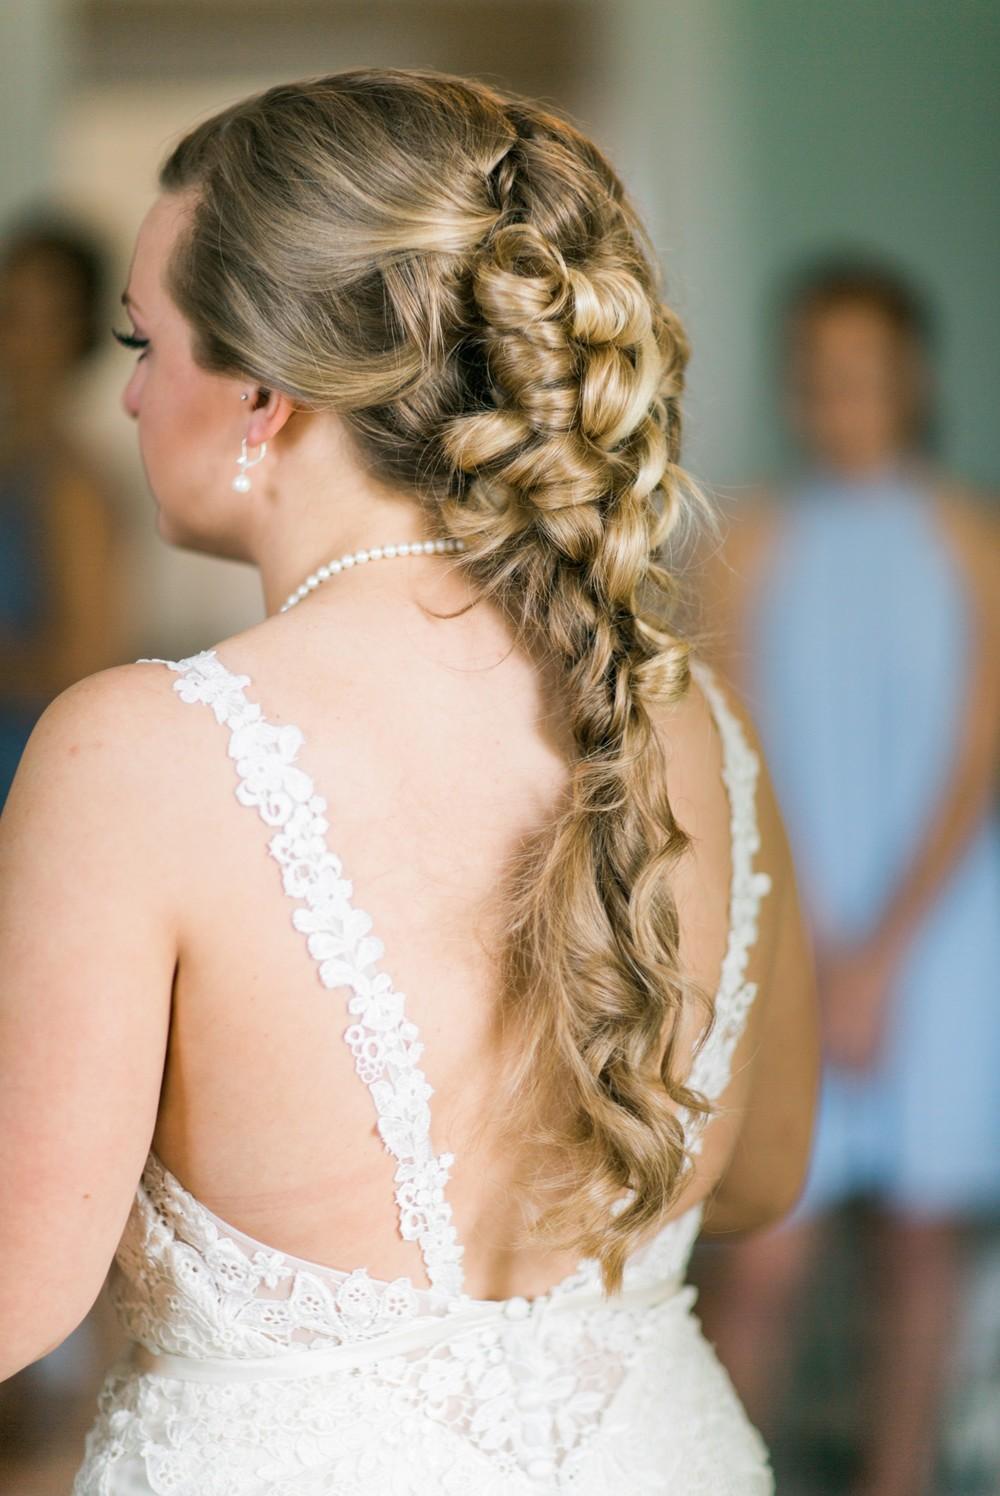 trivium_lynchburg_va_wedding_estate_wedding_photography_wedding_photographers (12).jpg